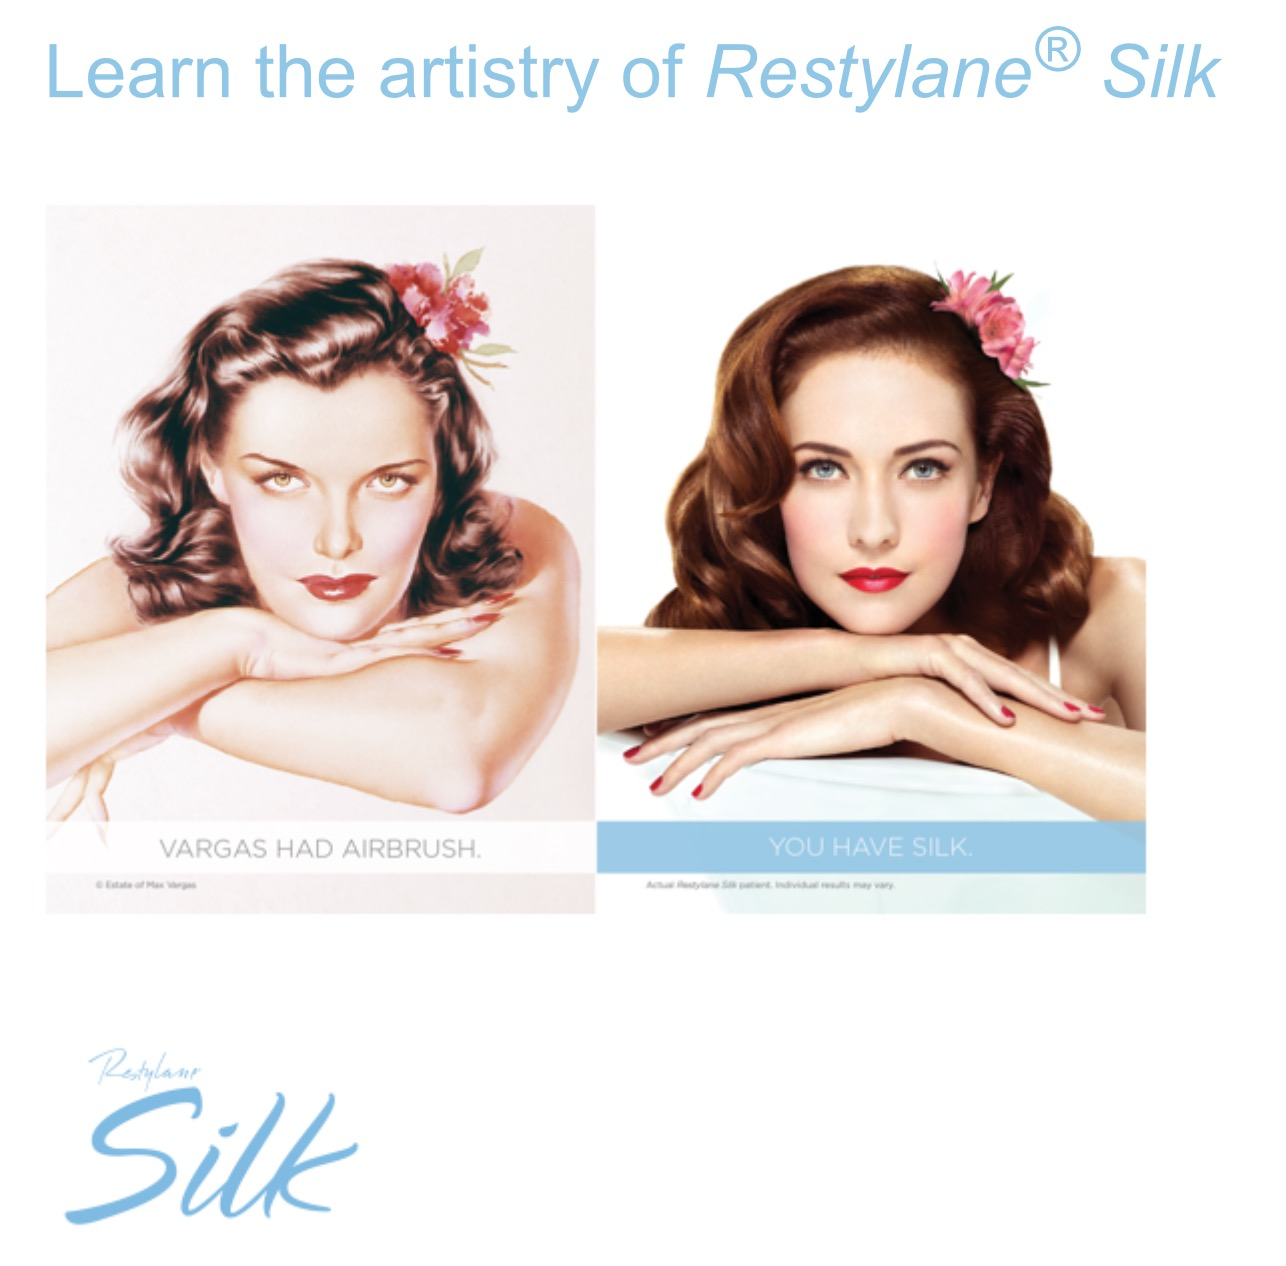 Restylane Siik image